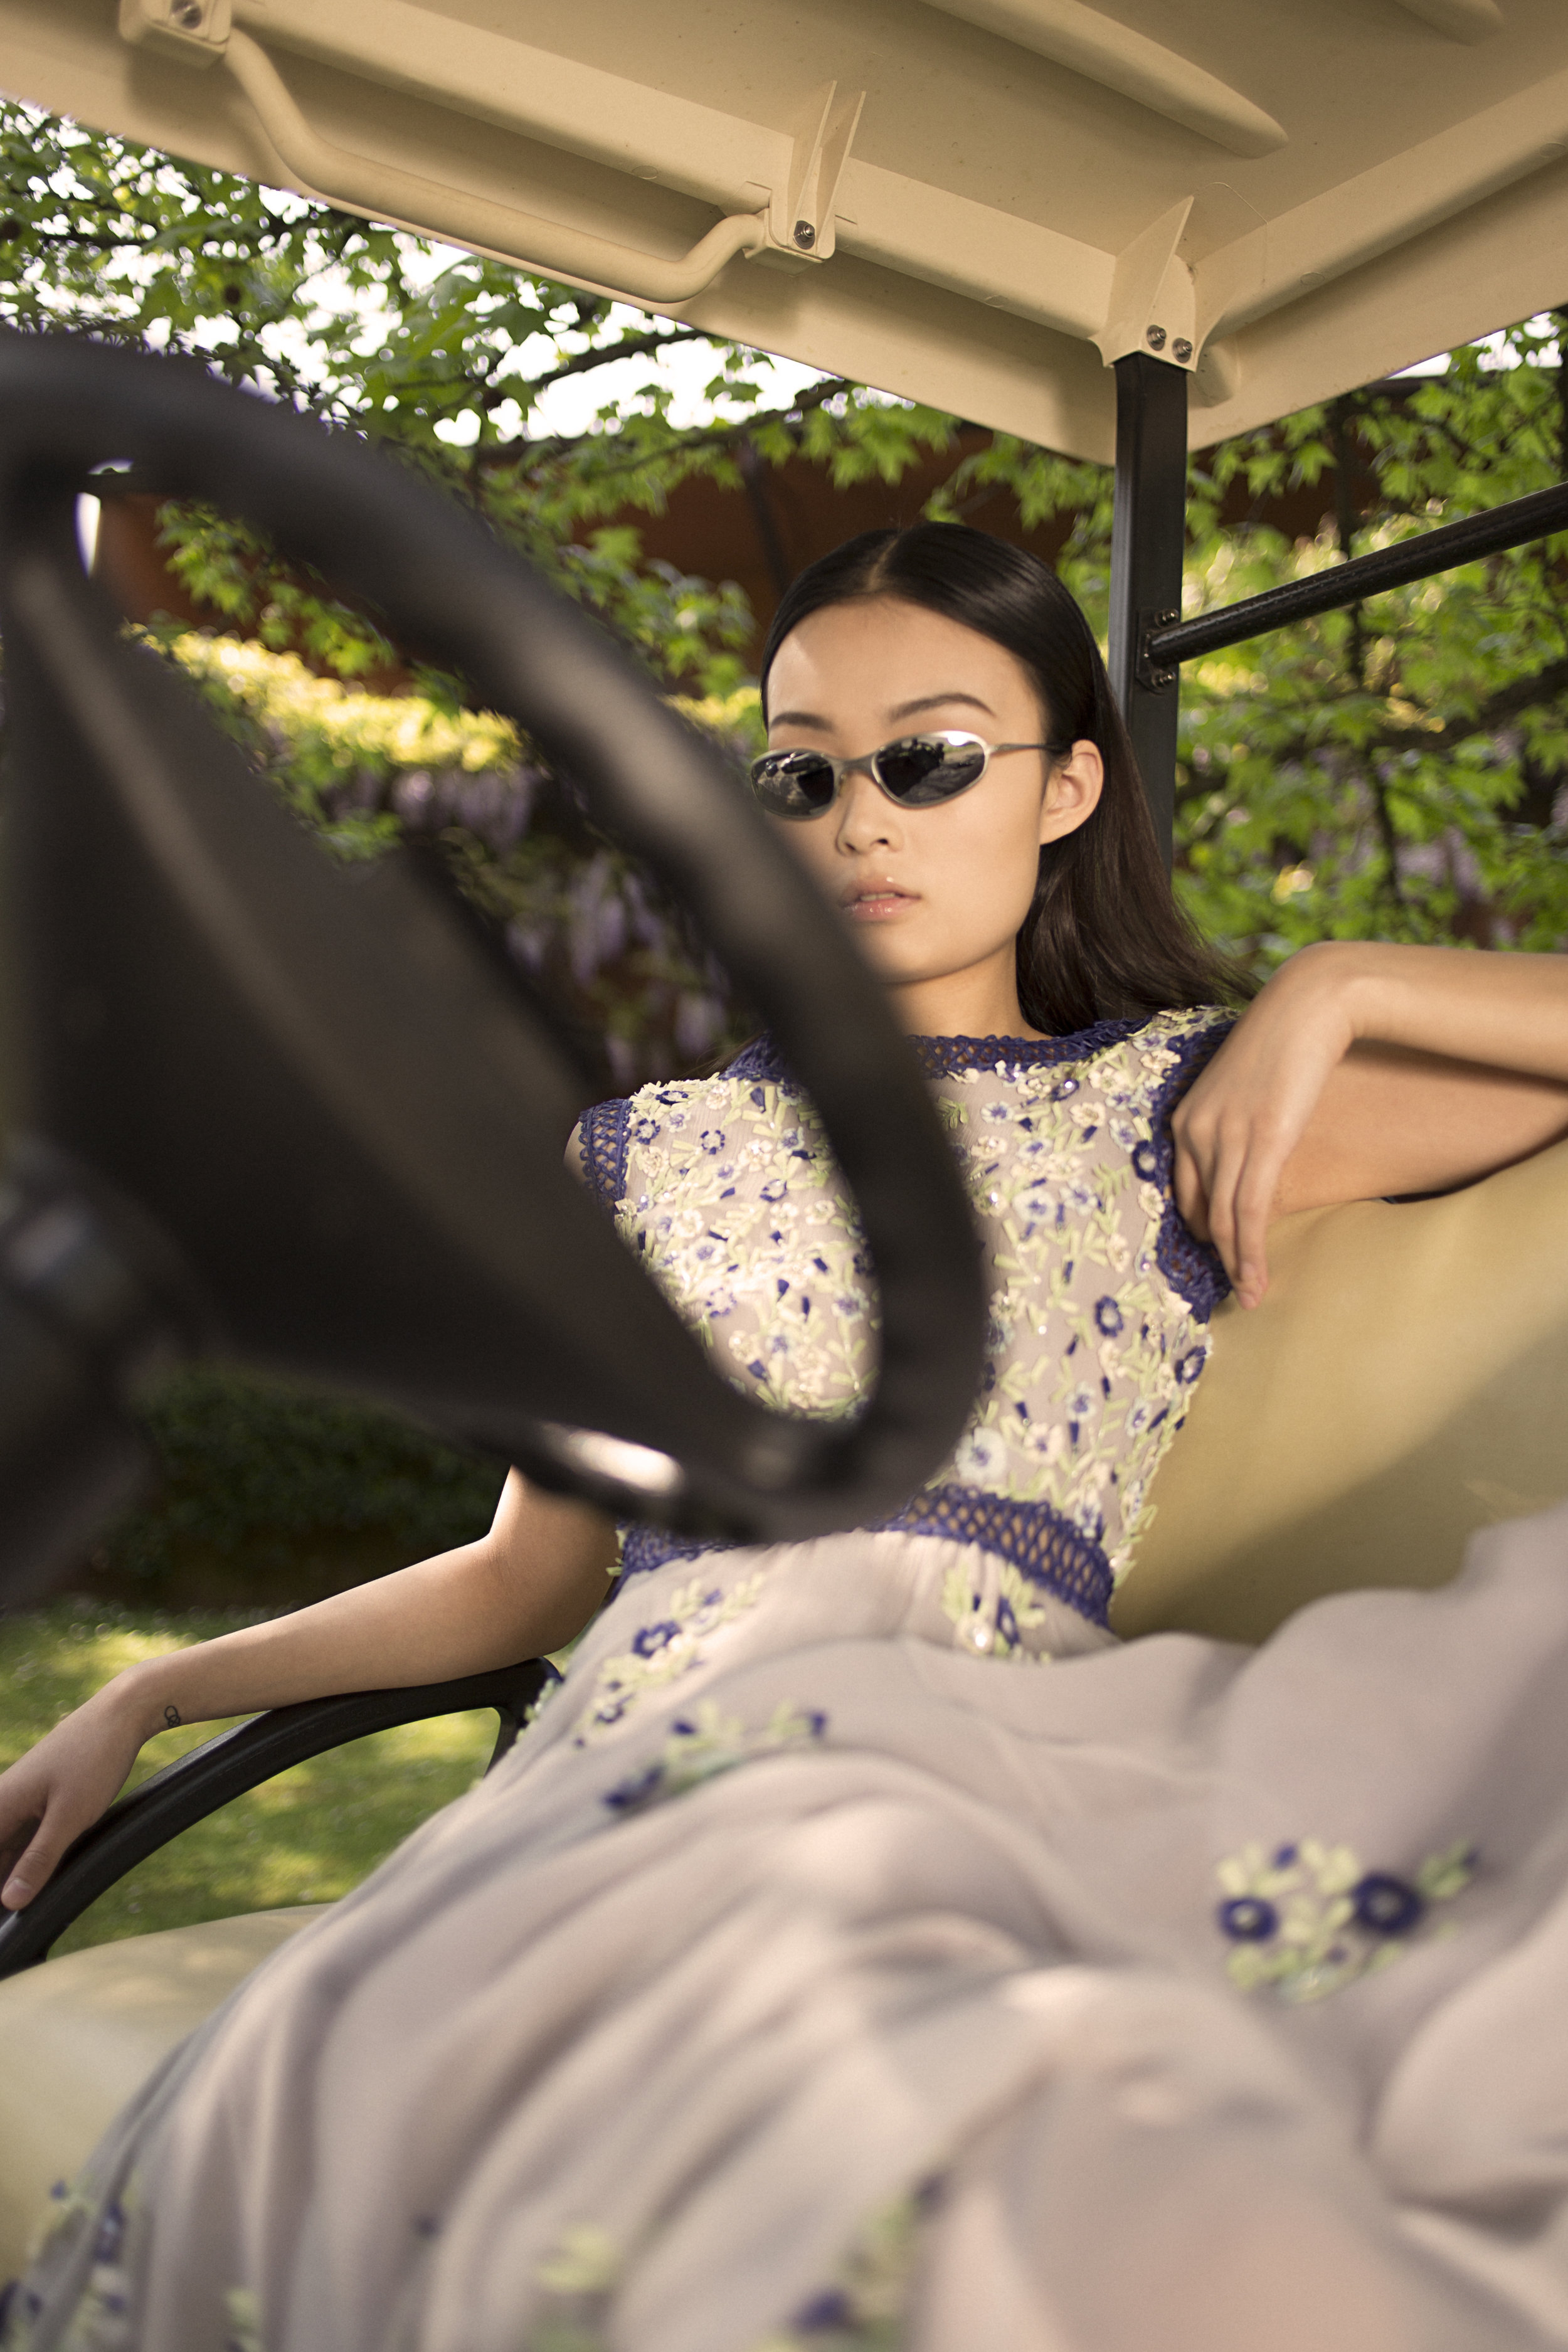 dress LUISA BECCARIA, sunglasses VINTAGE